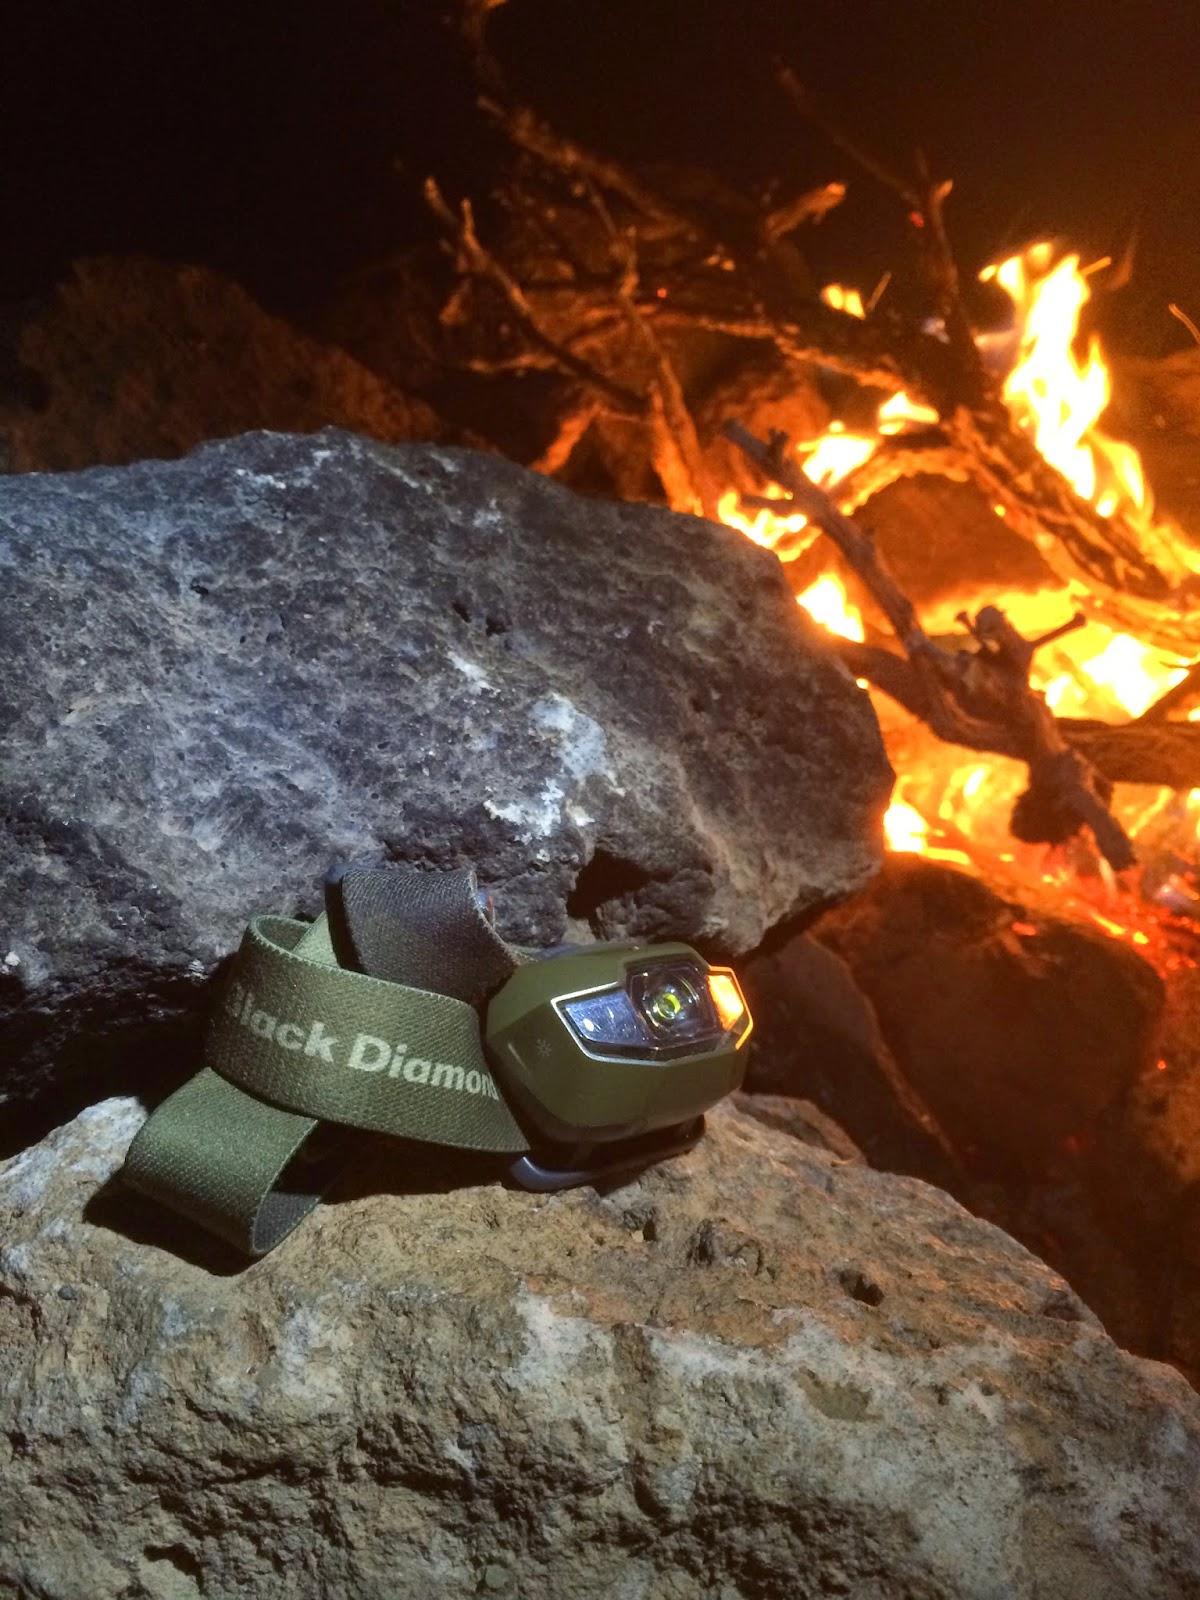 Black Diamond Spot Headlamp next to a fire